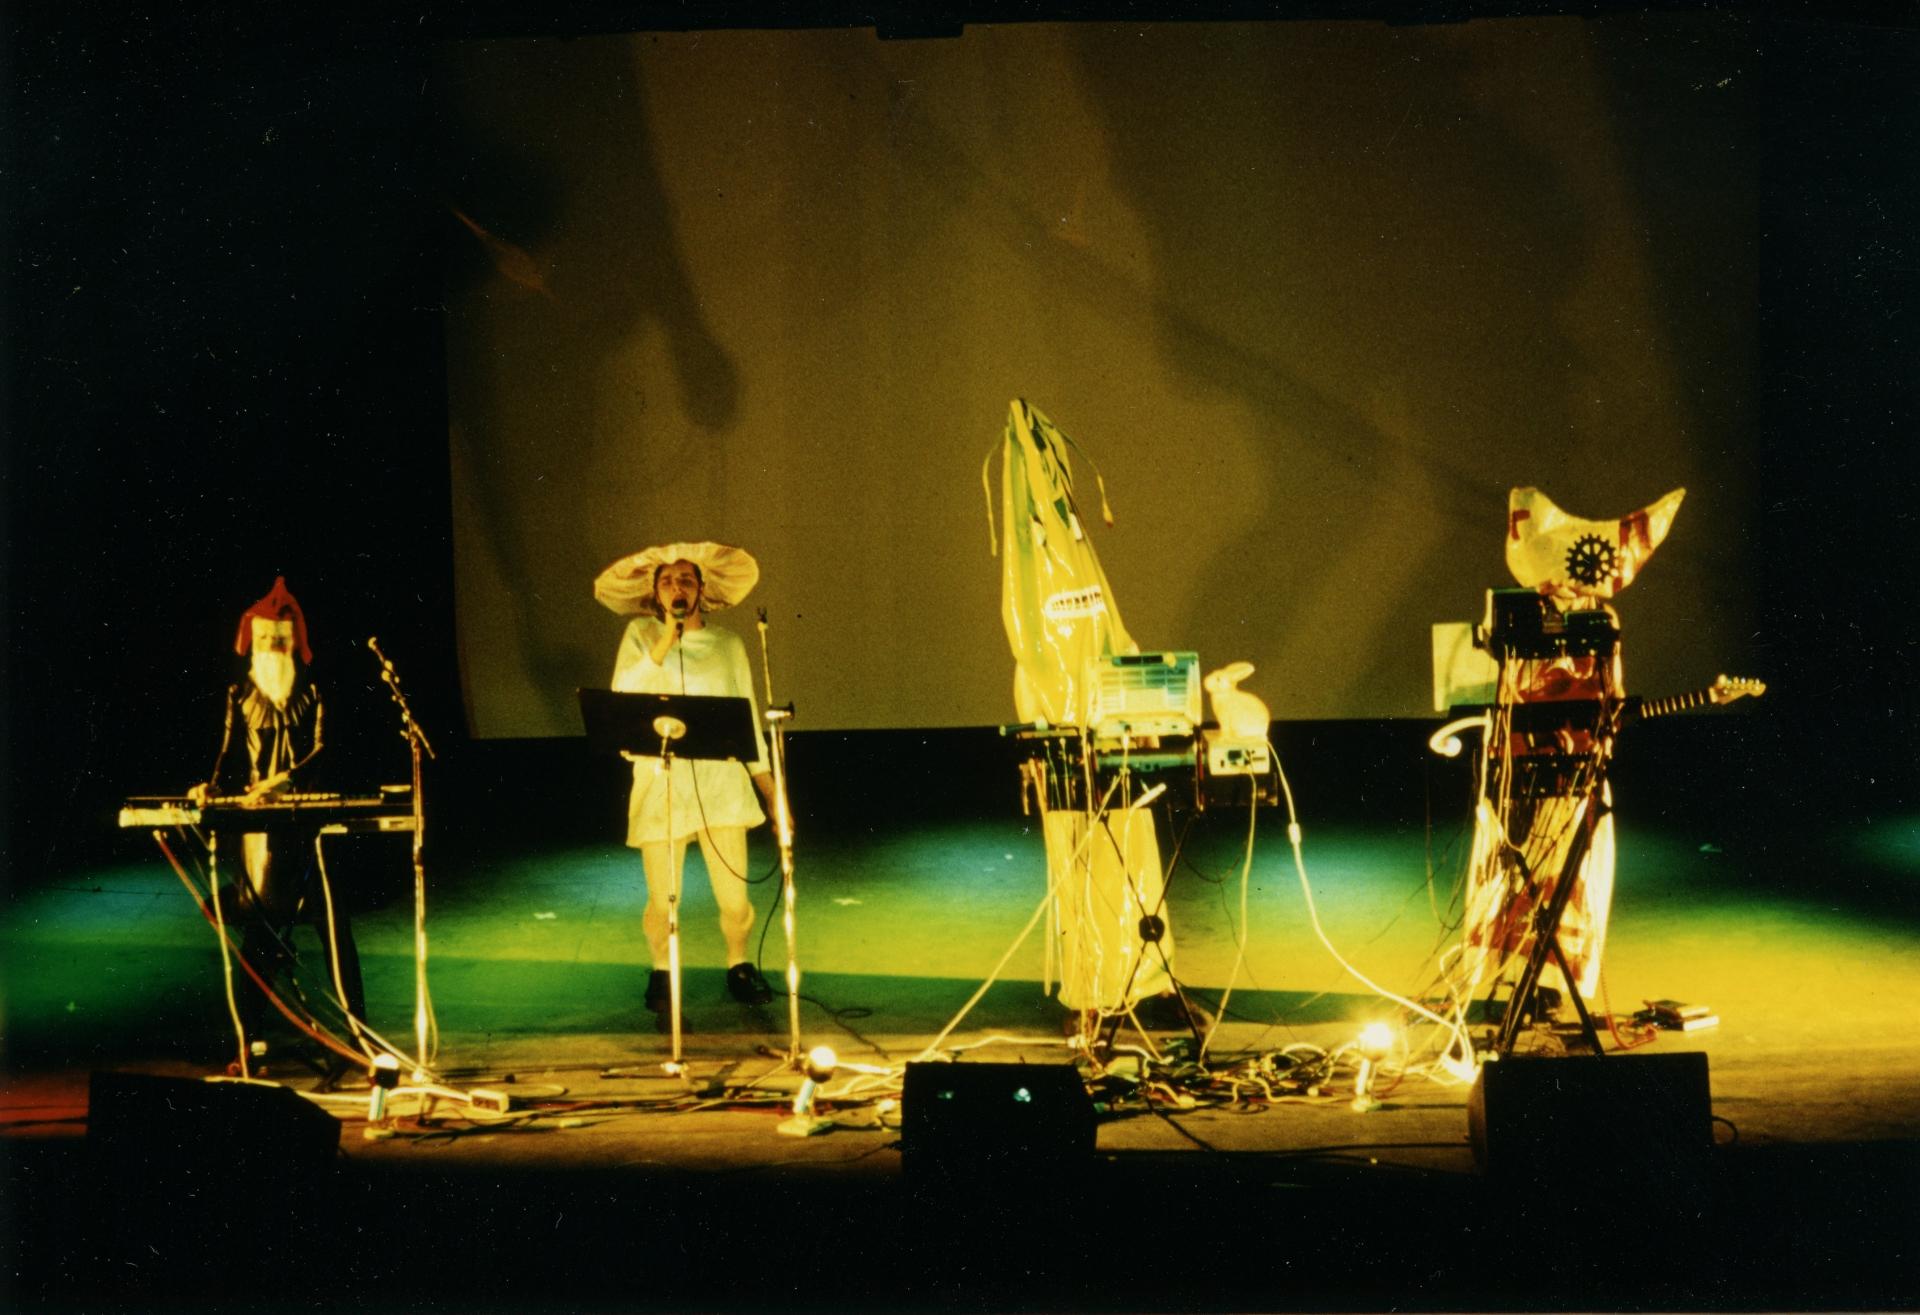 AG. Geige, 3. Internationales Art Rock Festival, Frankfurt nad Menem, 1991, fot. Dieter Wuschanski